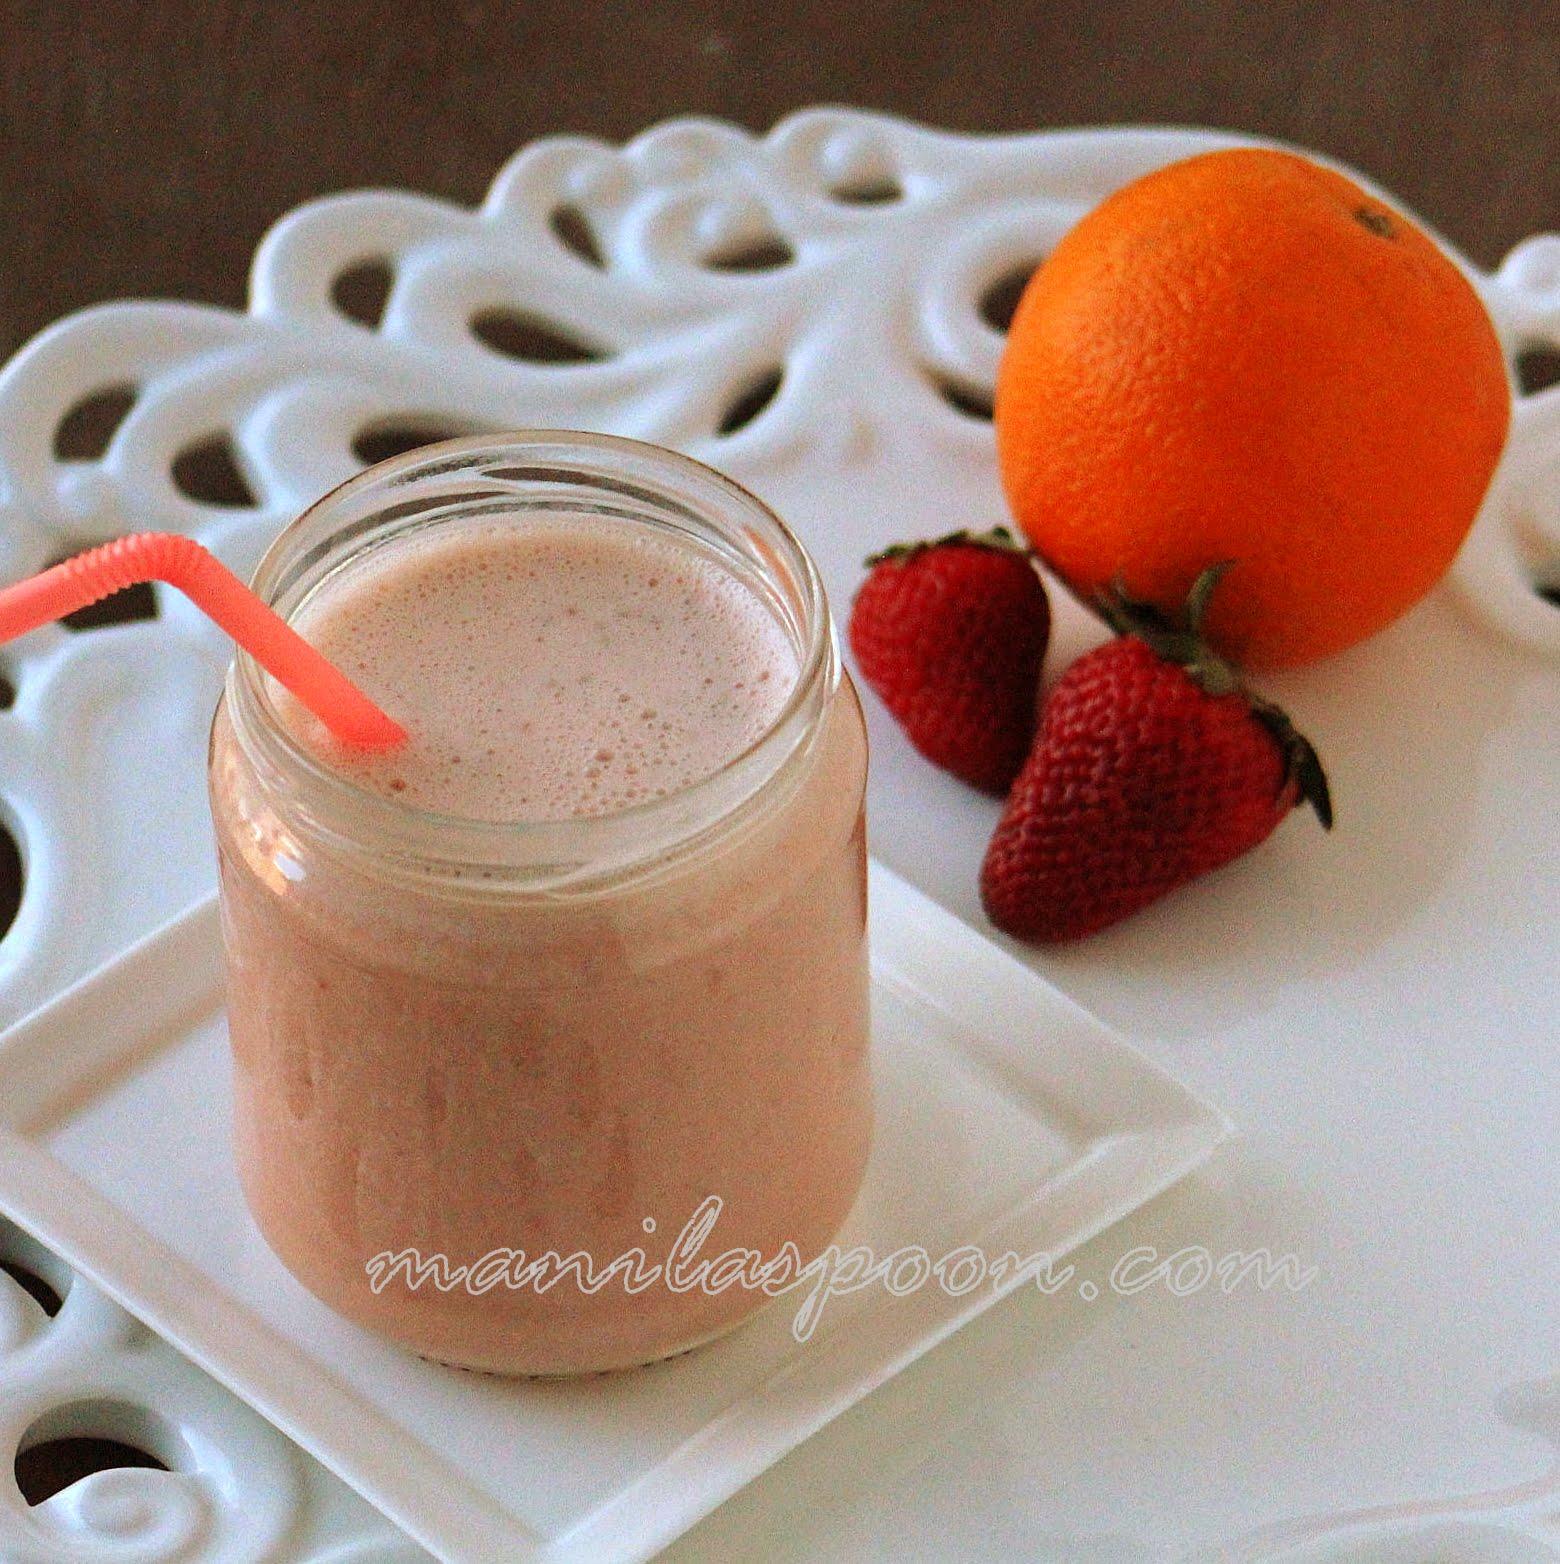 Strawberry Banana and Orange Smoothie